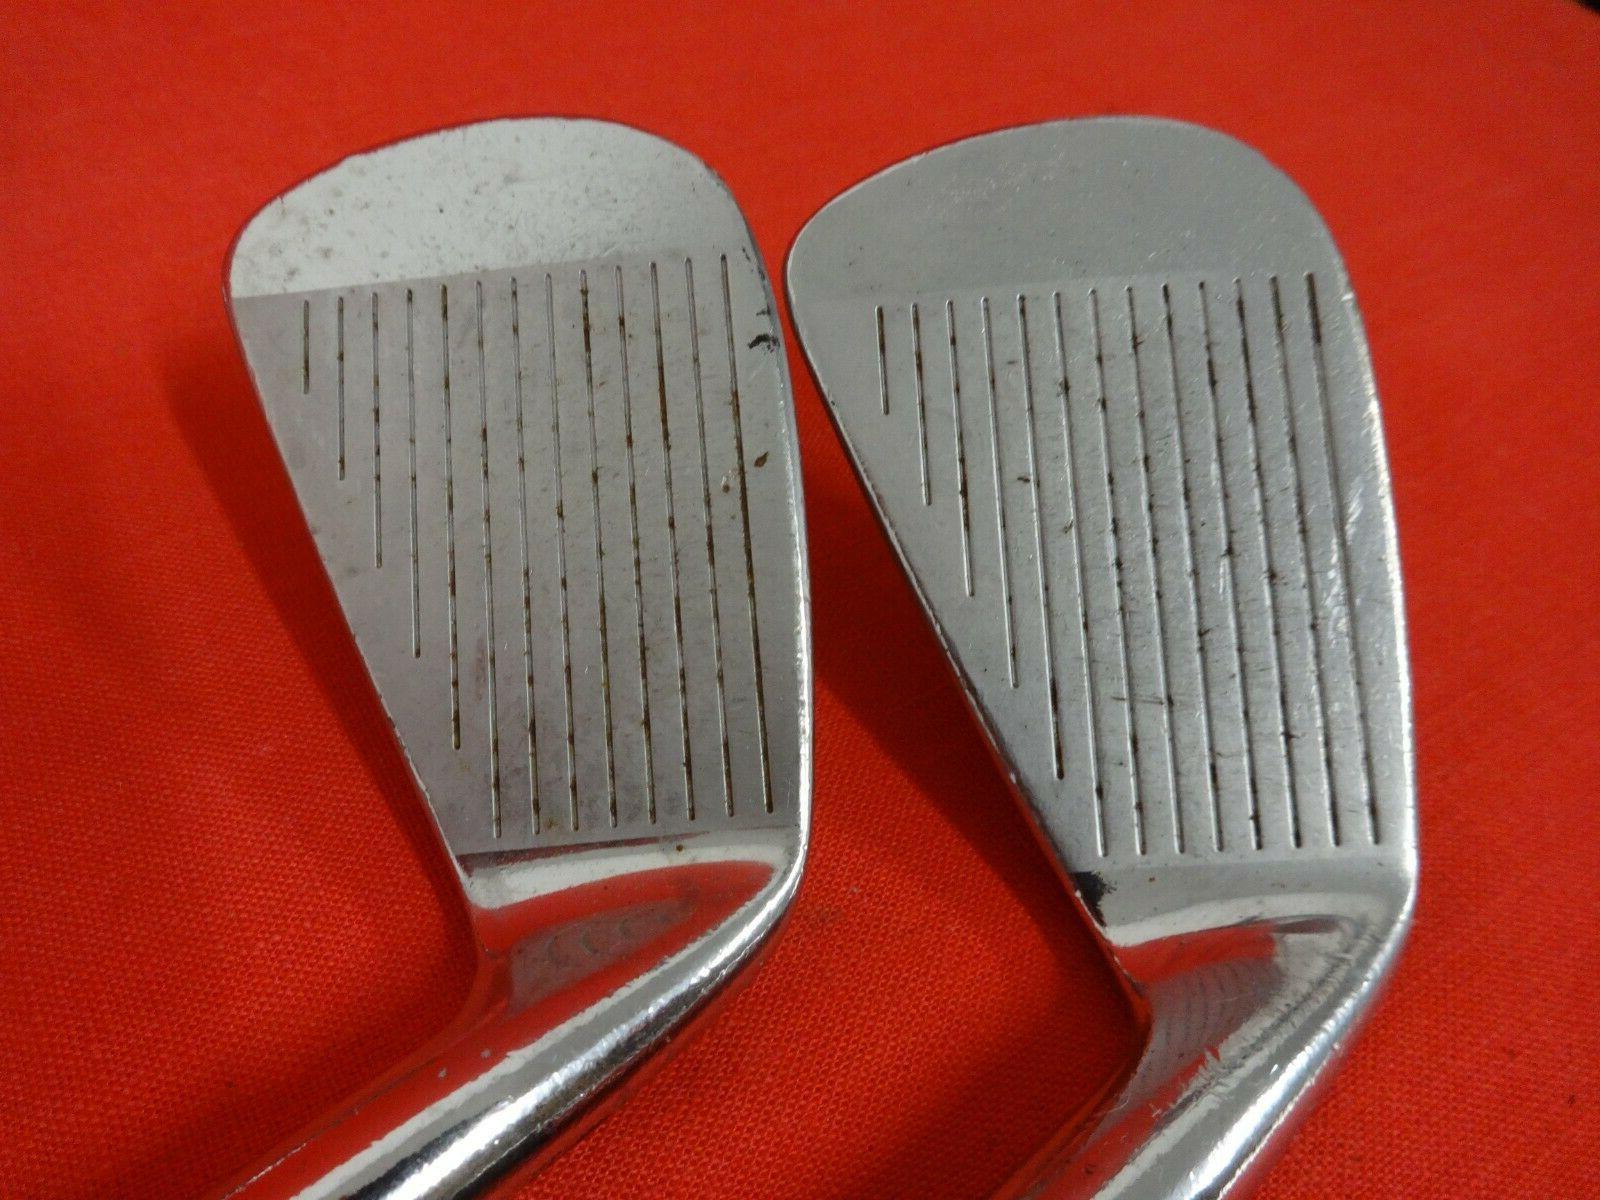 NIKE Combo 3-9 Iron Right Regular Flex Steel